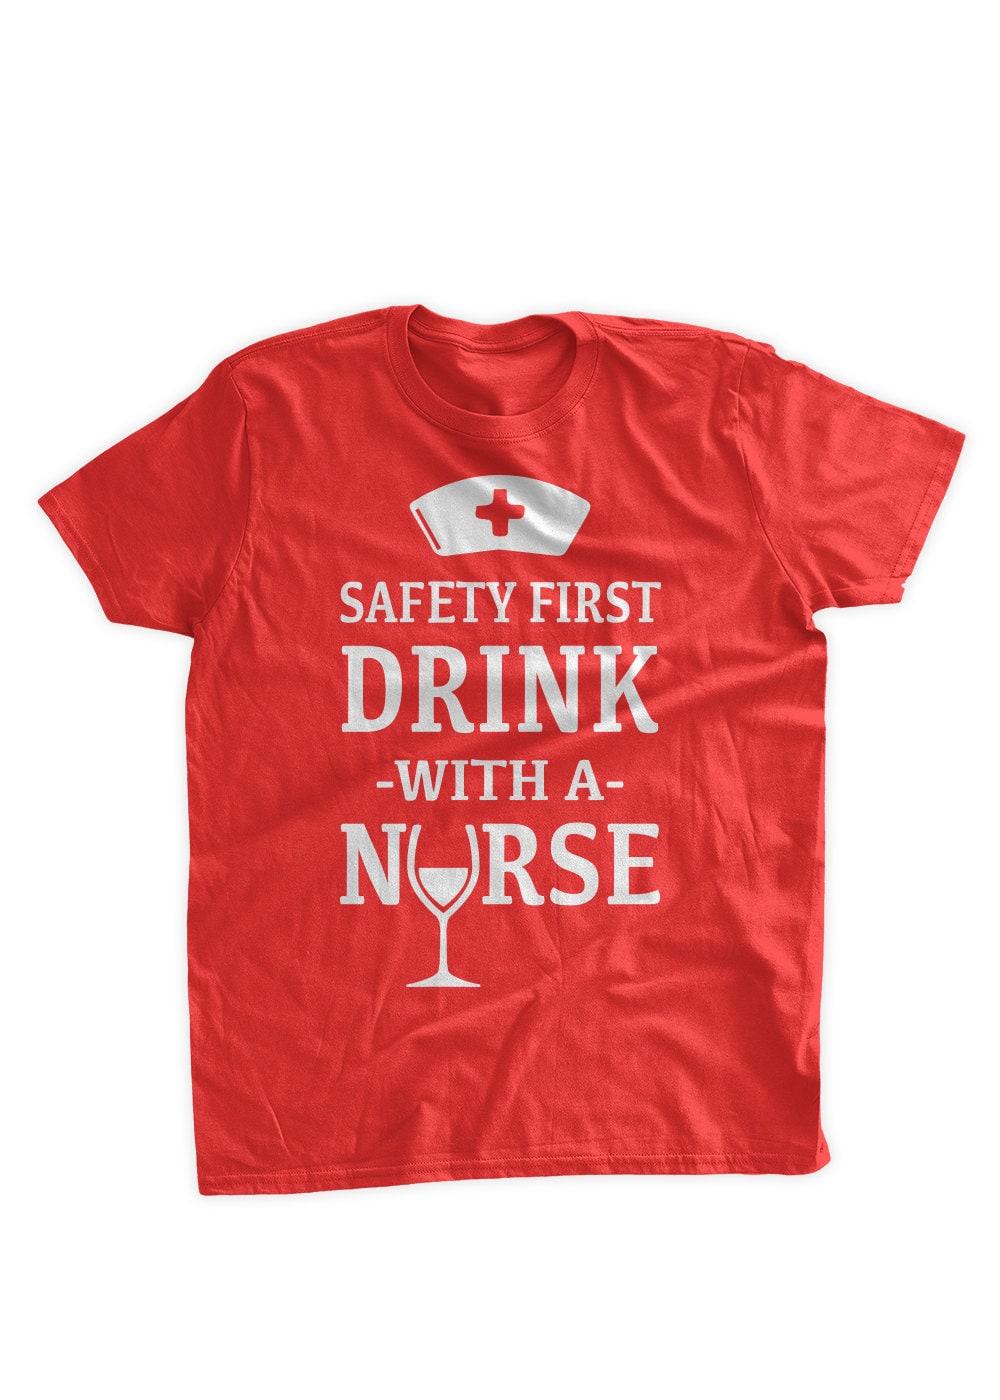 Safety first drink with a nurse t shirt nursing nurse rpn rn for I am a nurse t shirt